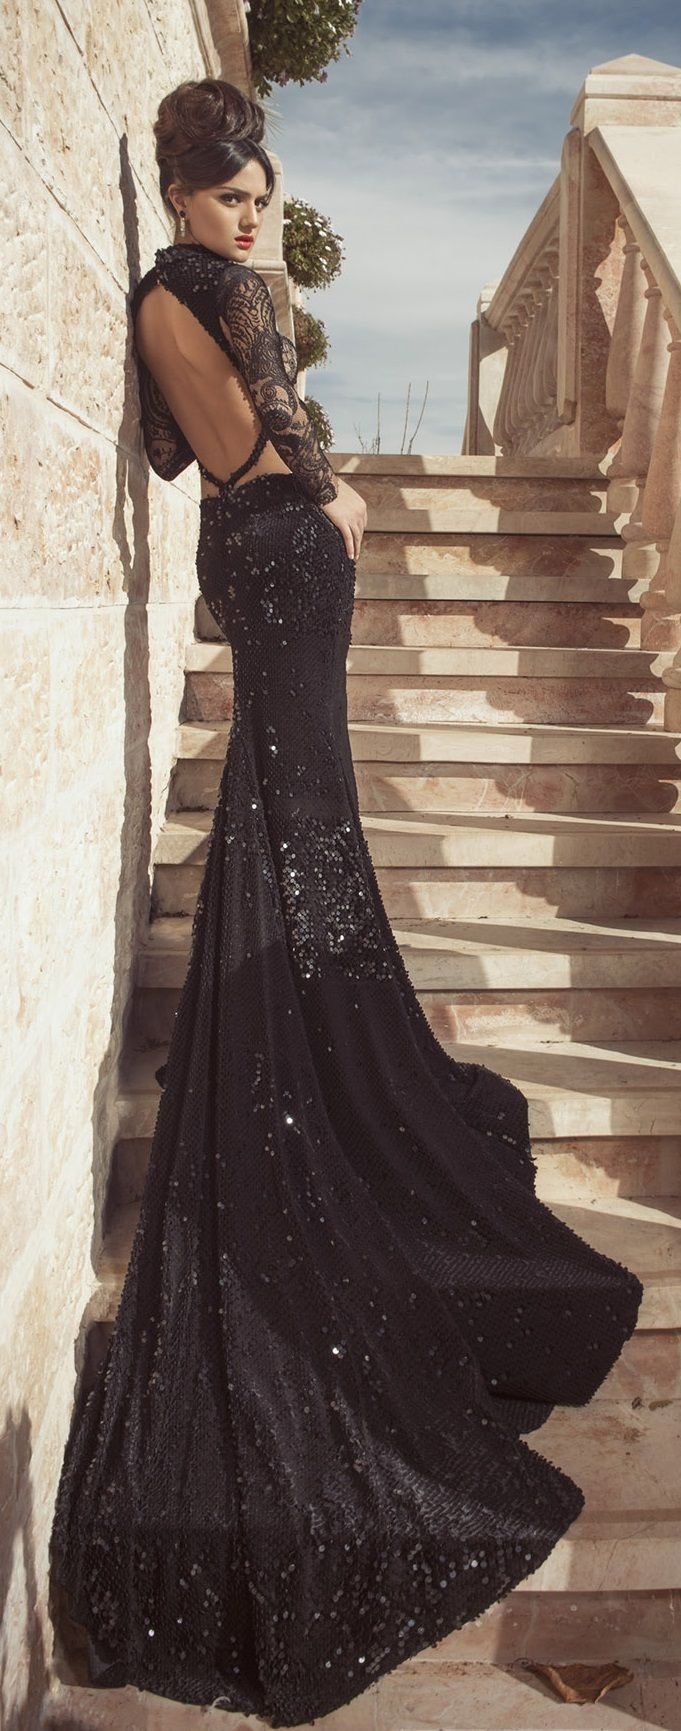 best evening dresses abiti da sera images on pinterest long